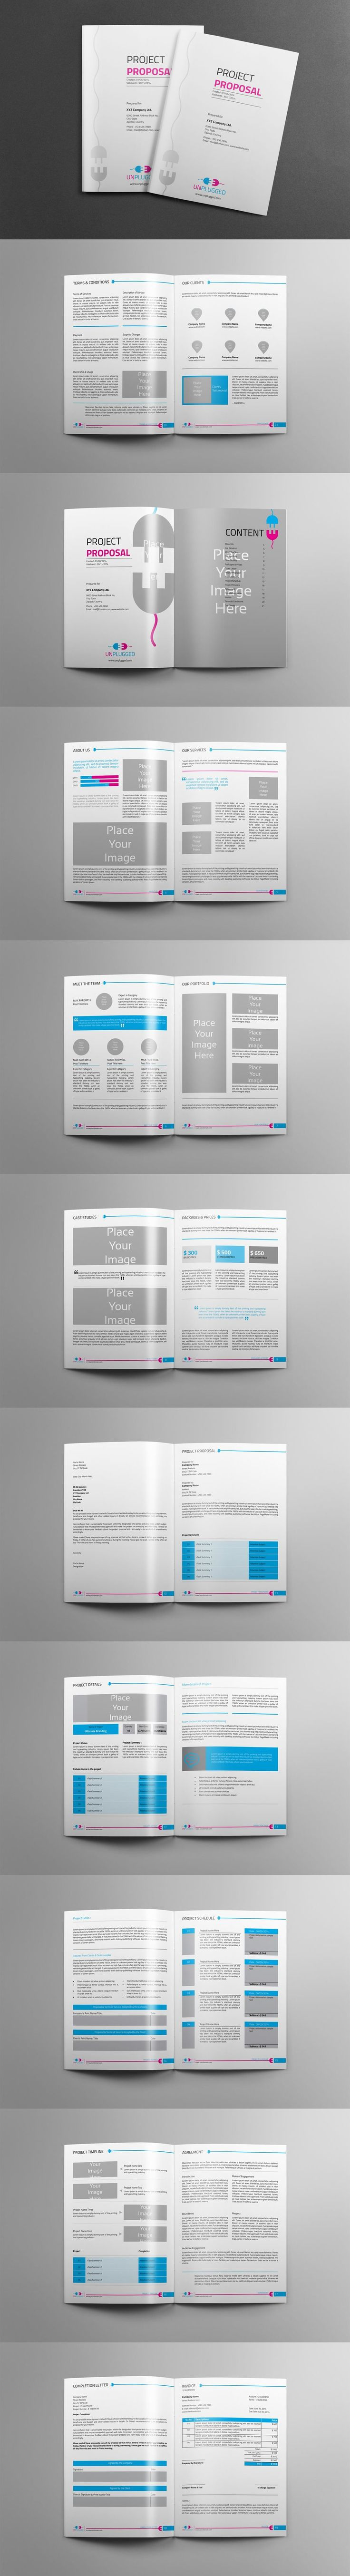 41 best BROCHURE images on Pinterest | Brochure template, Page ...